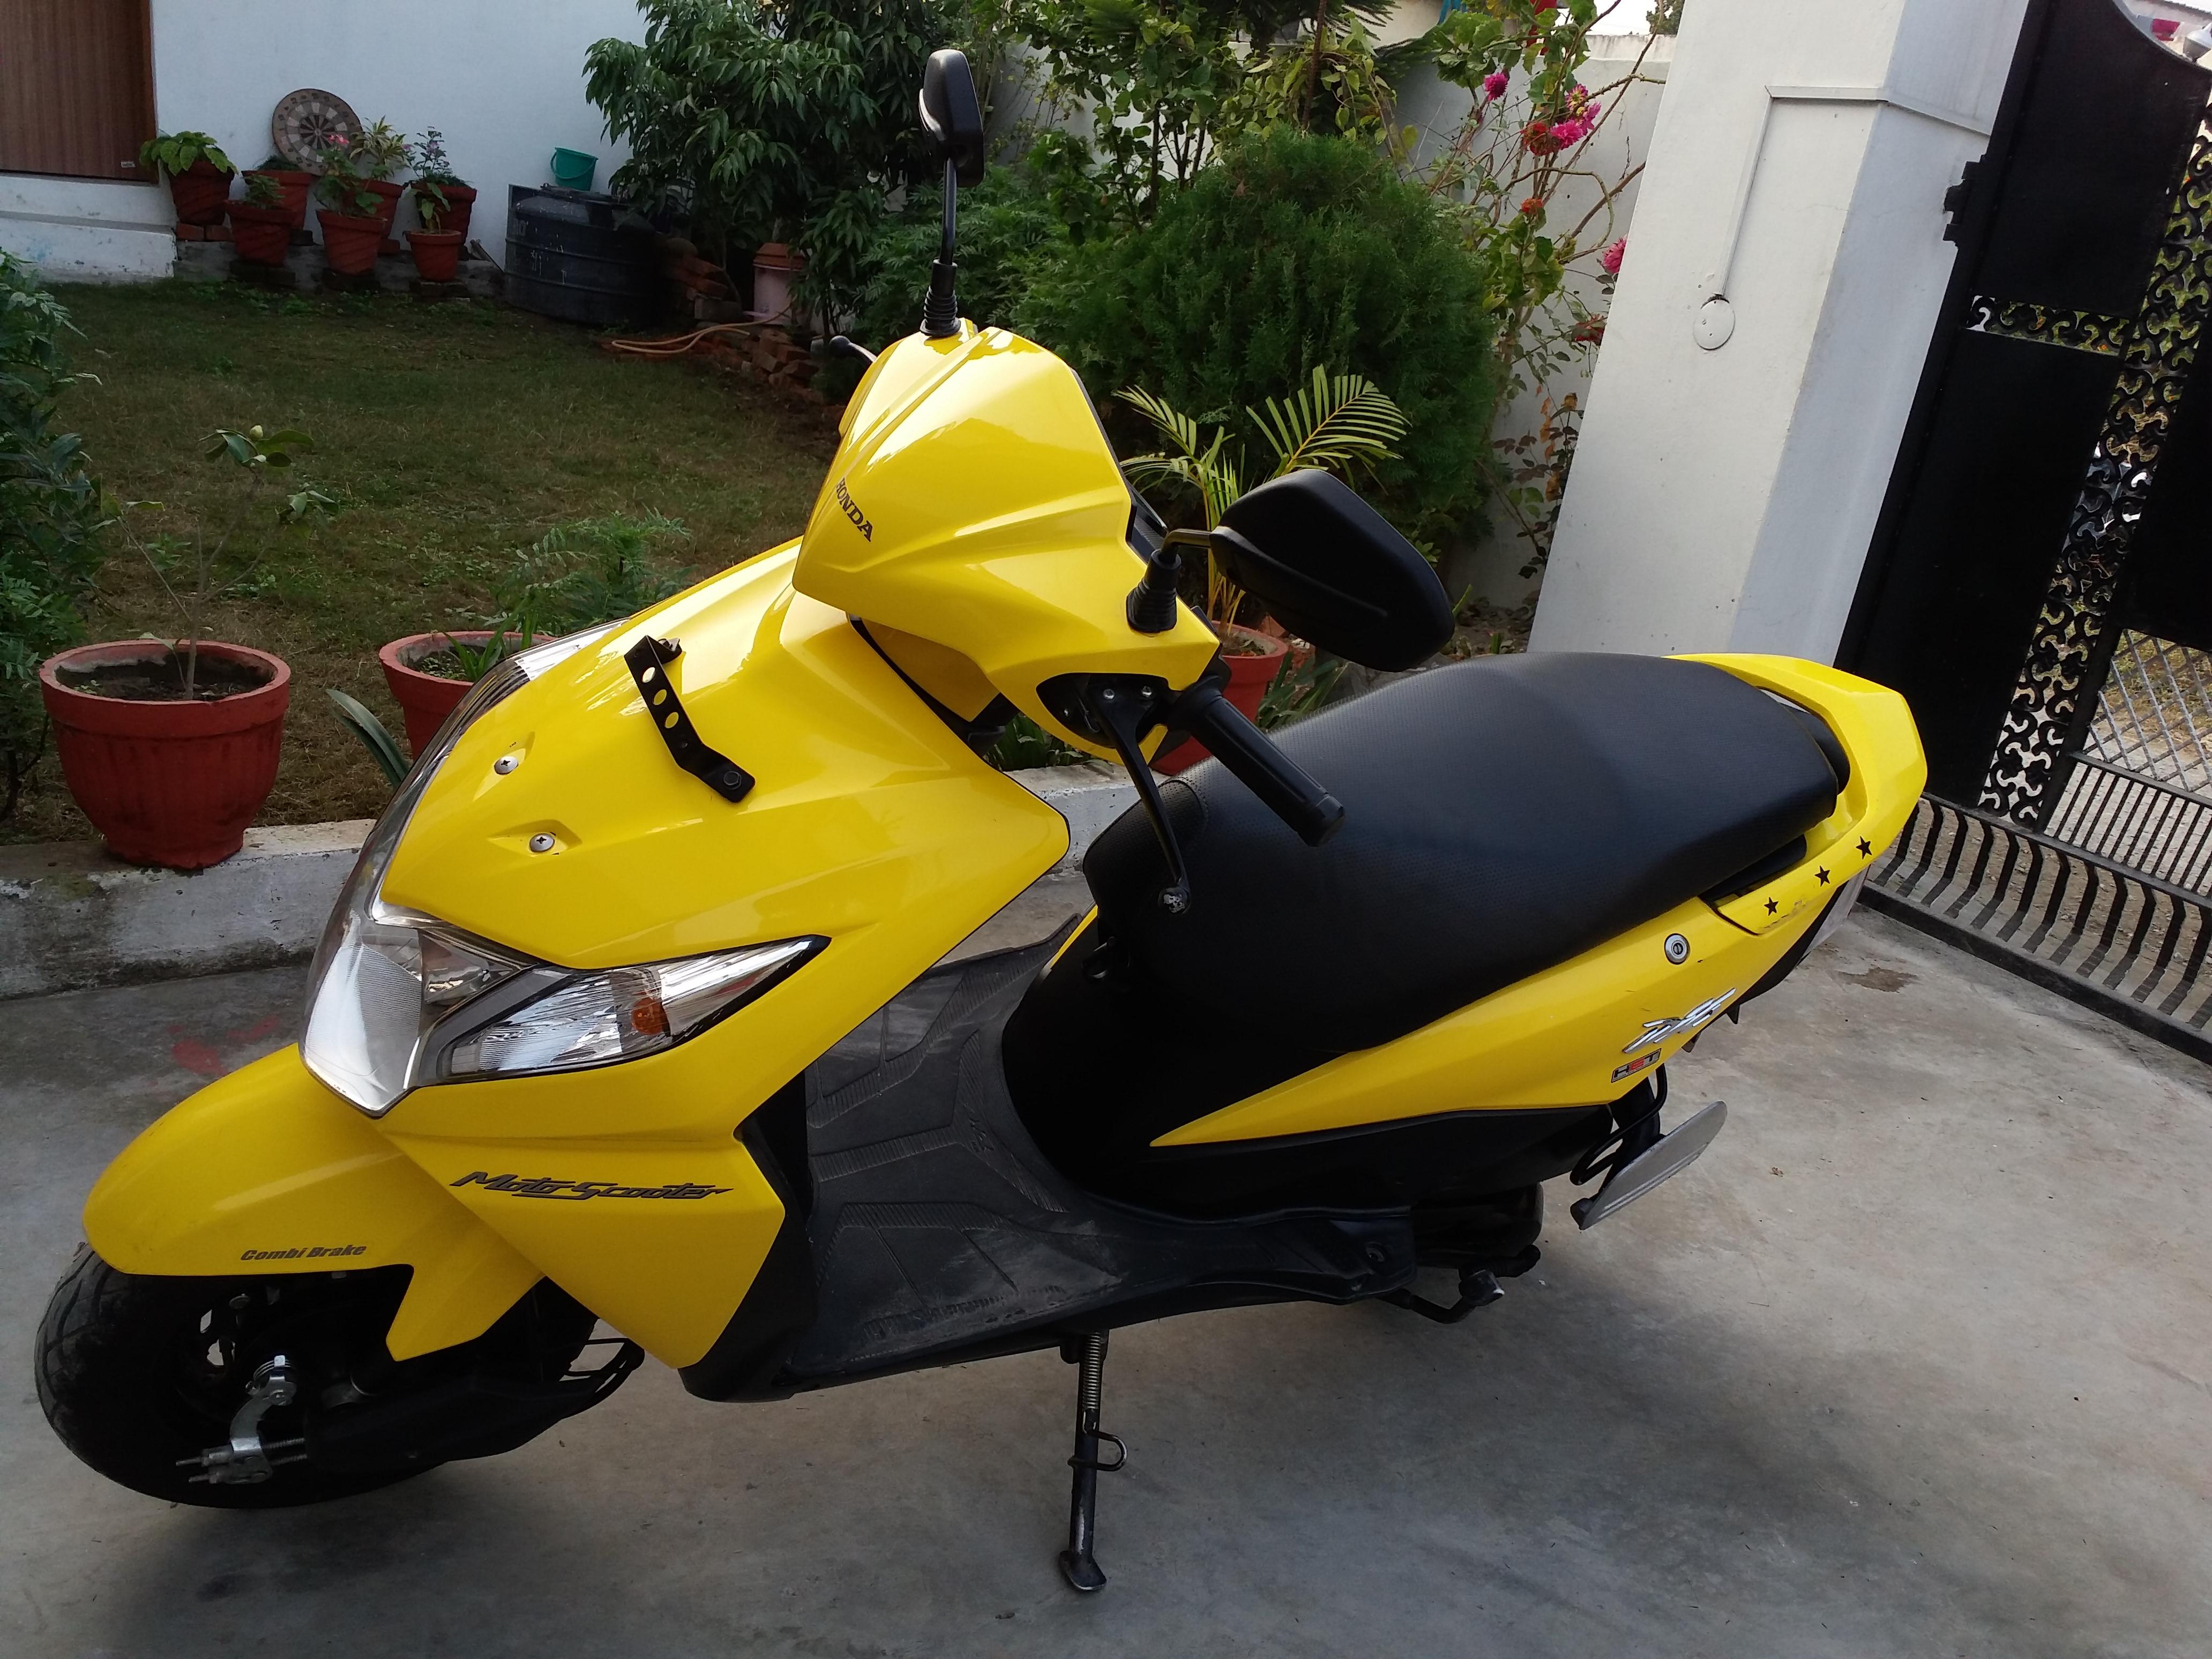 Honda Luxury Brand >> My MOTO Scooter - HONDA DIO Customer Review - MouthShut.com